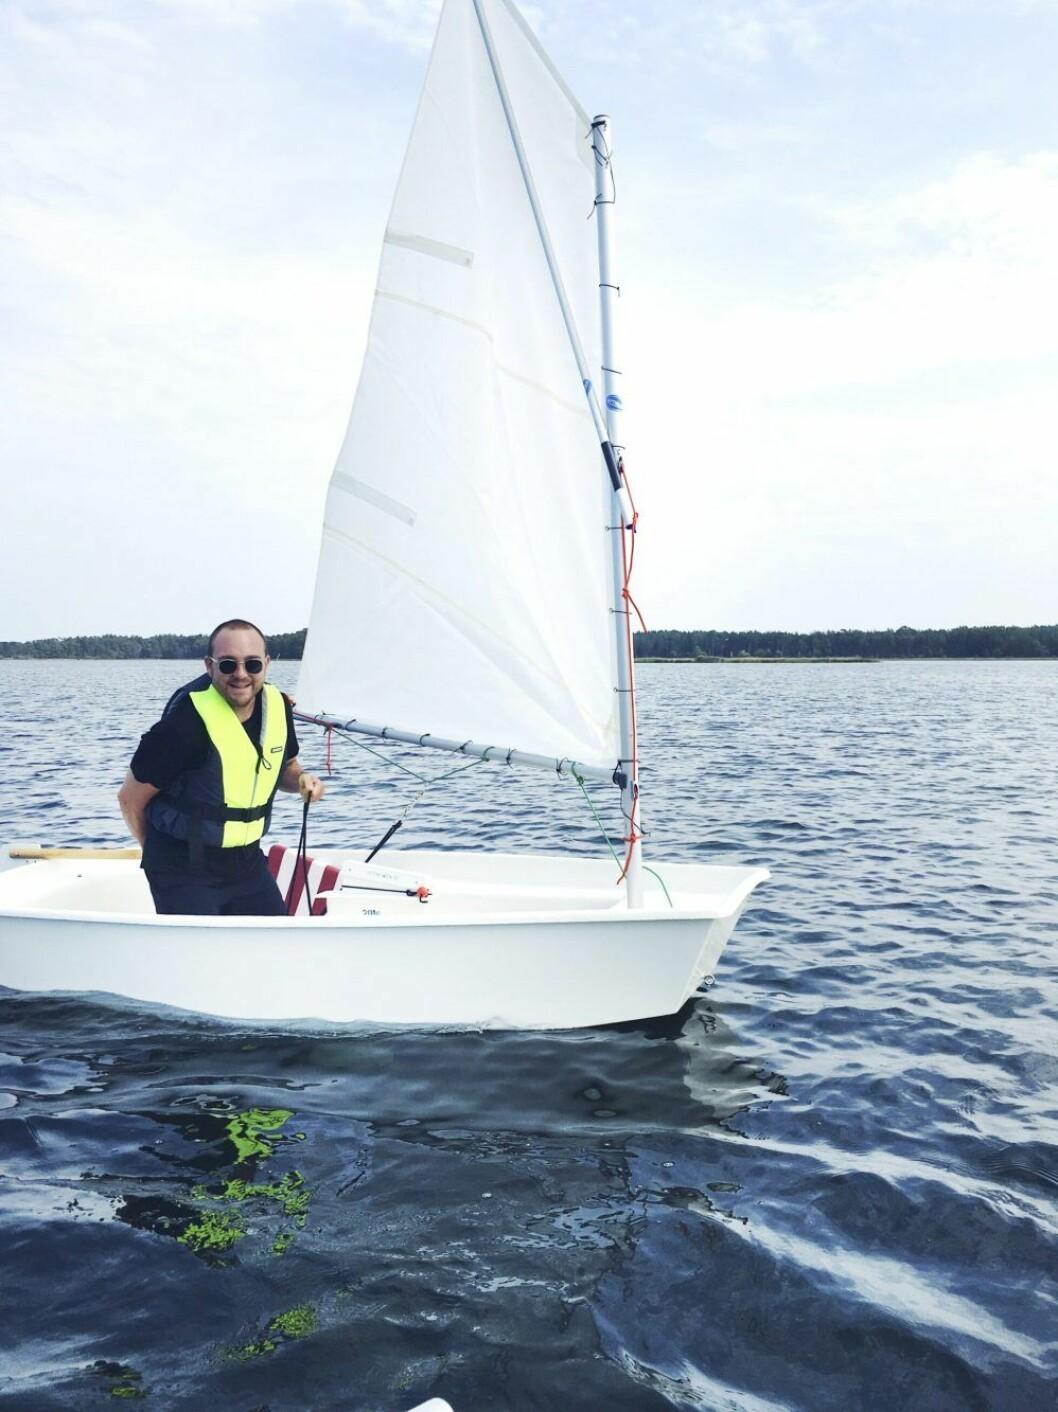 ELLEs AD-assistent Oscar Fjellman på jolle på Öland